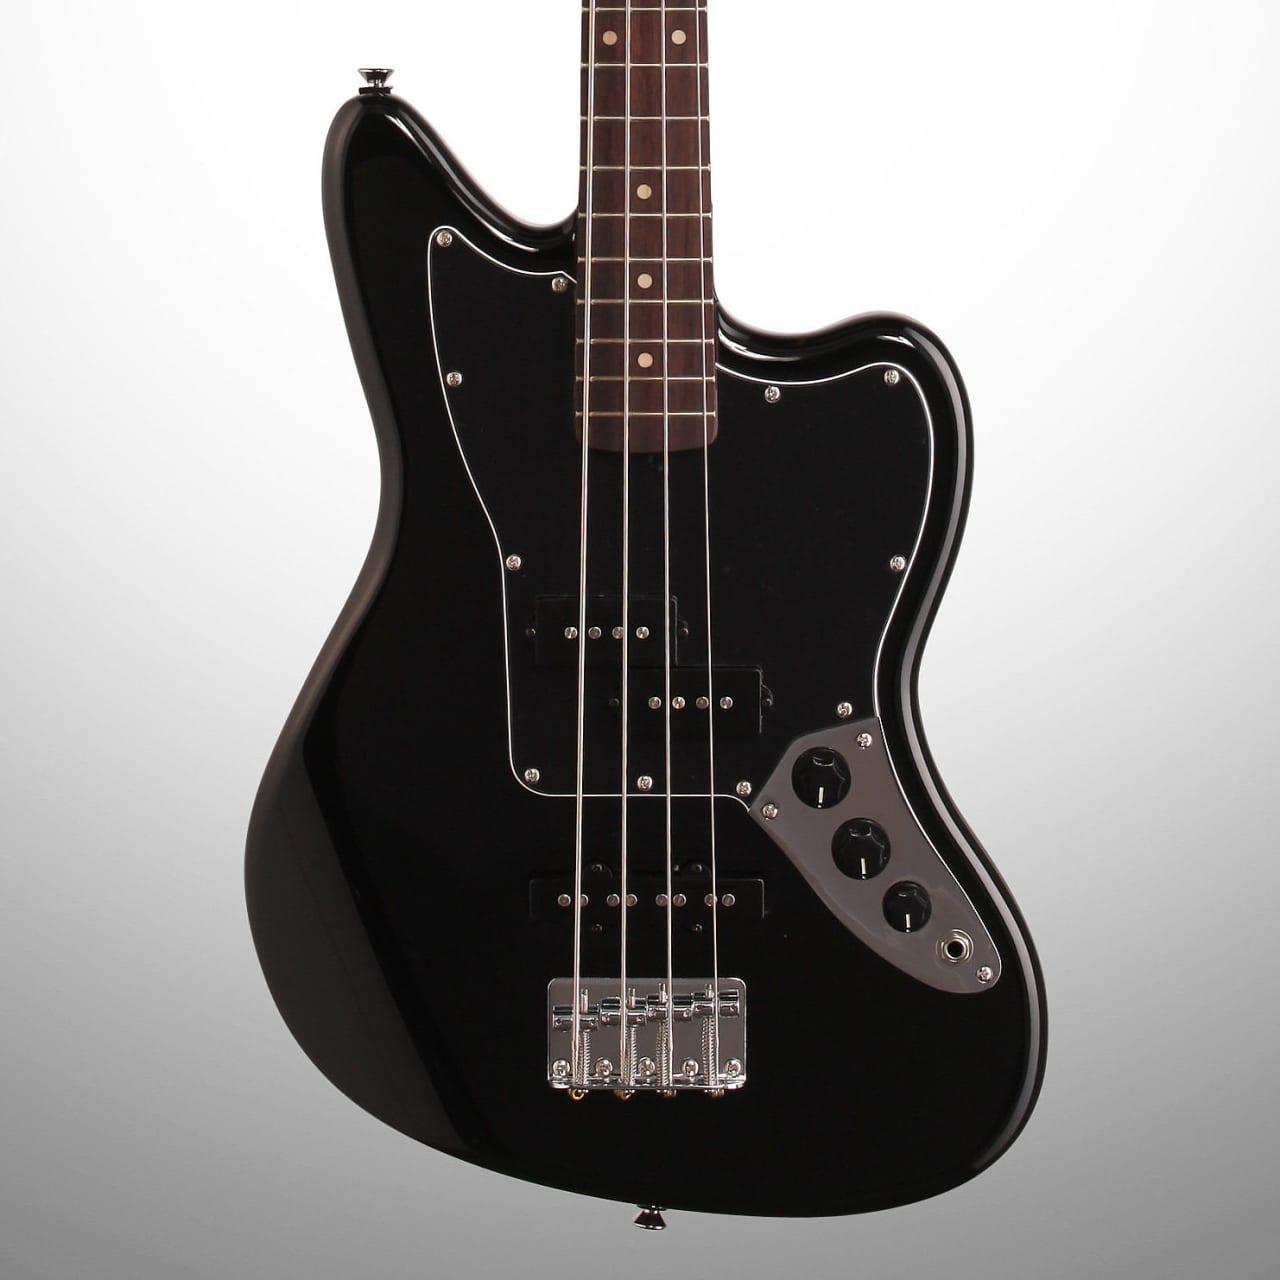 Squier Vintage Modified Jaguar Special Ss Electric Bass